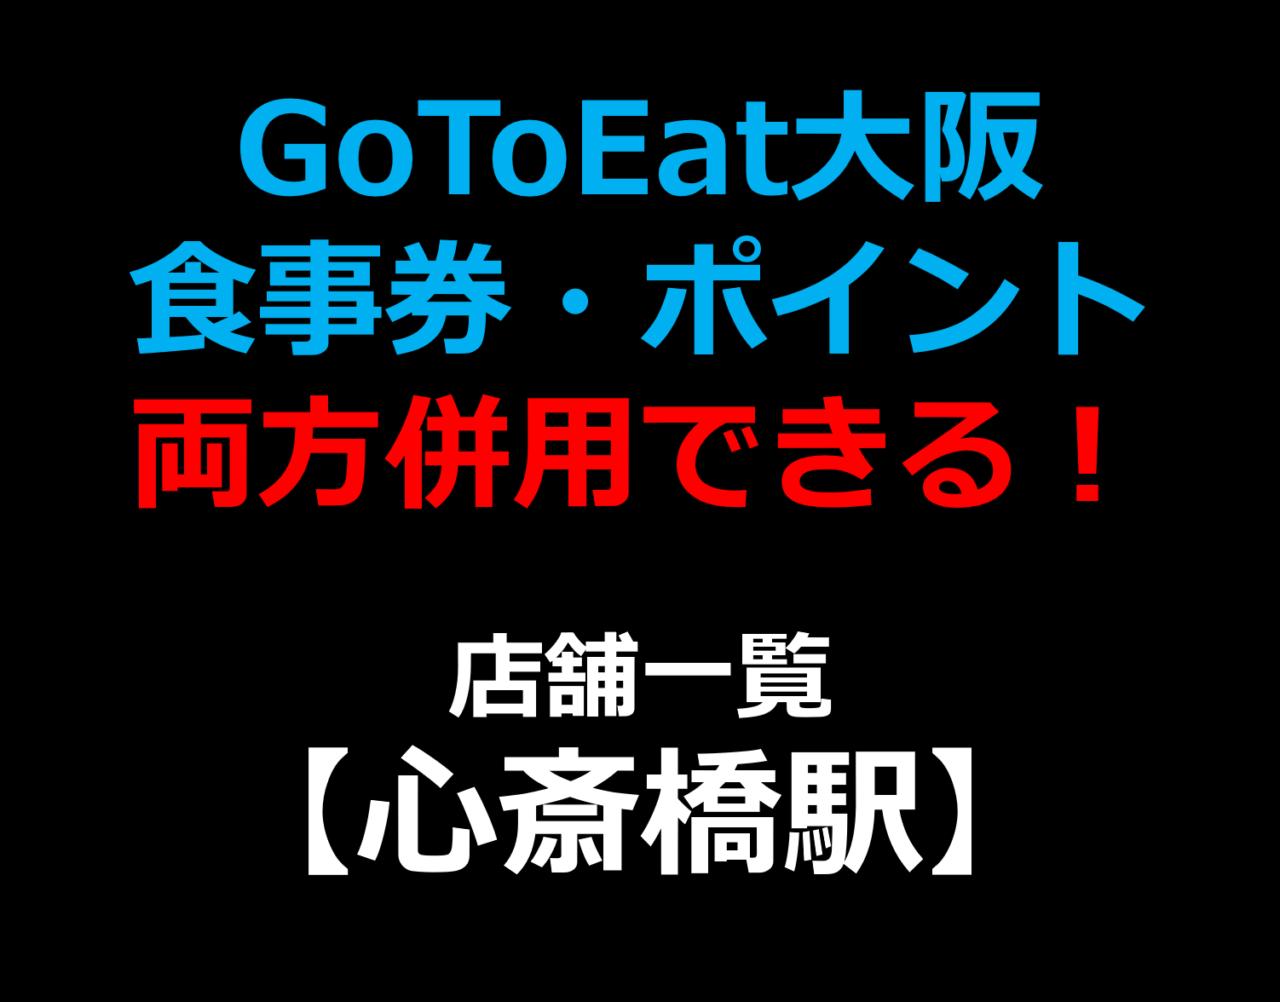 GoToEat大阪で食事券・予約サイトのポイント両方併用できる!使える!店舗一覧 【心斎橋駅】